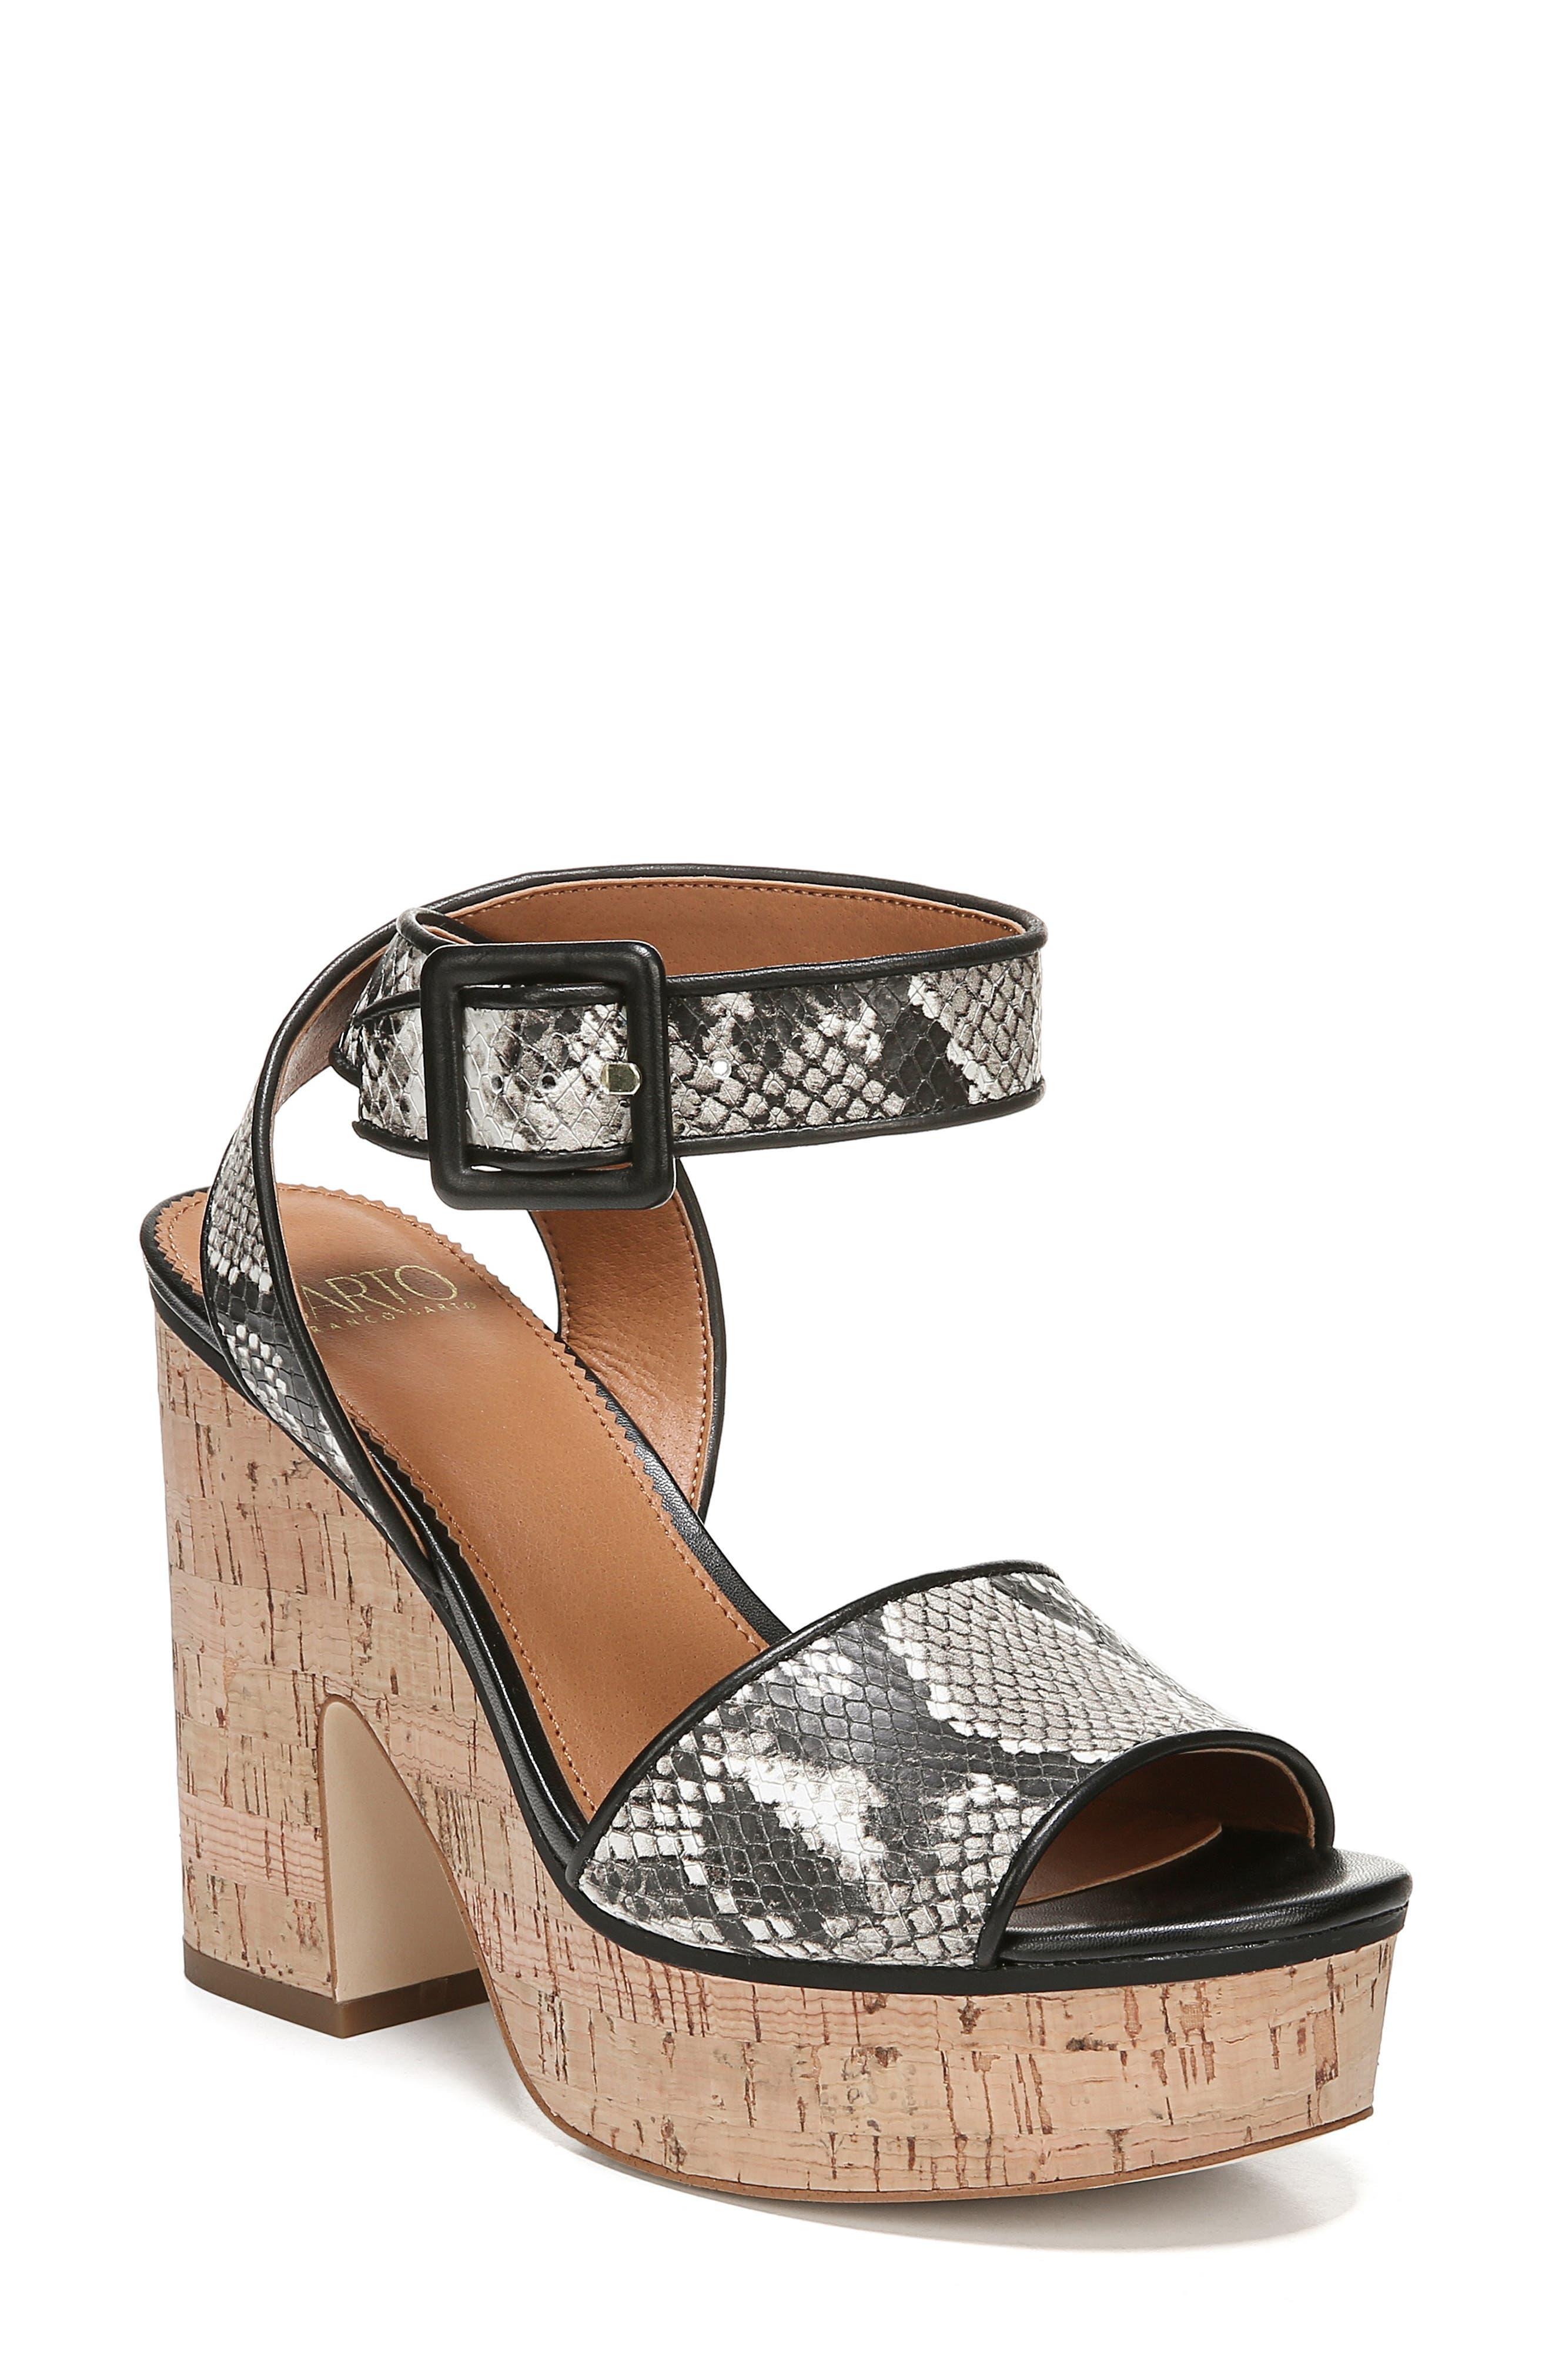 Sarto By Franco Sarto Franny Platform Sandal- Beige